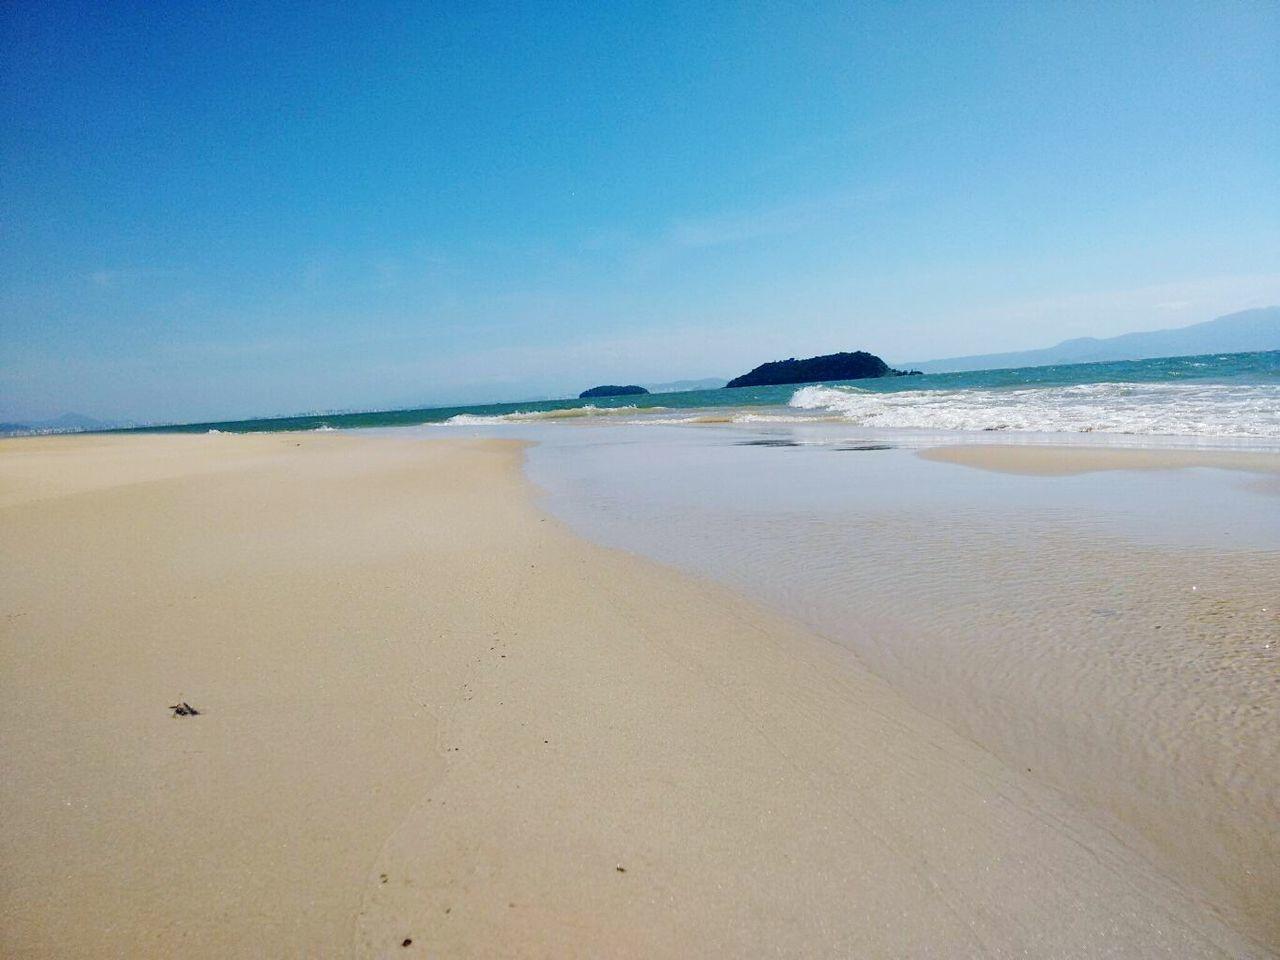 Pontal d Daniela, visão da olha de Ratones. Florianópolis - SC-Brasil Sea Beach Blue Sand Sky Horizon Over Water Scenics Outdoors No People Nature Wave Day